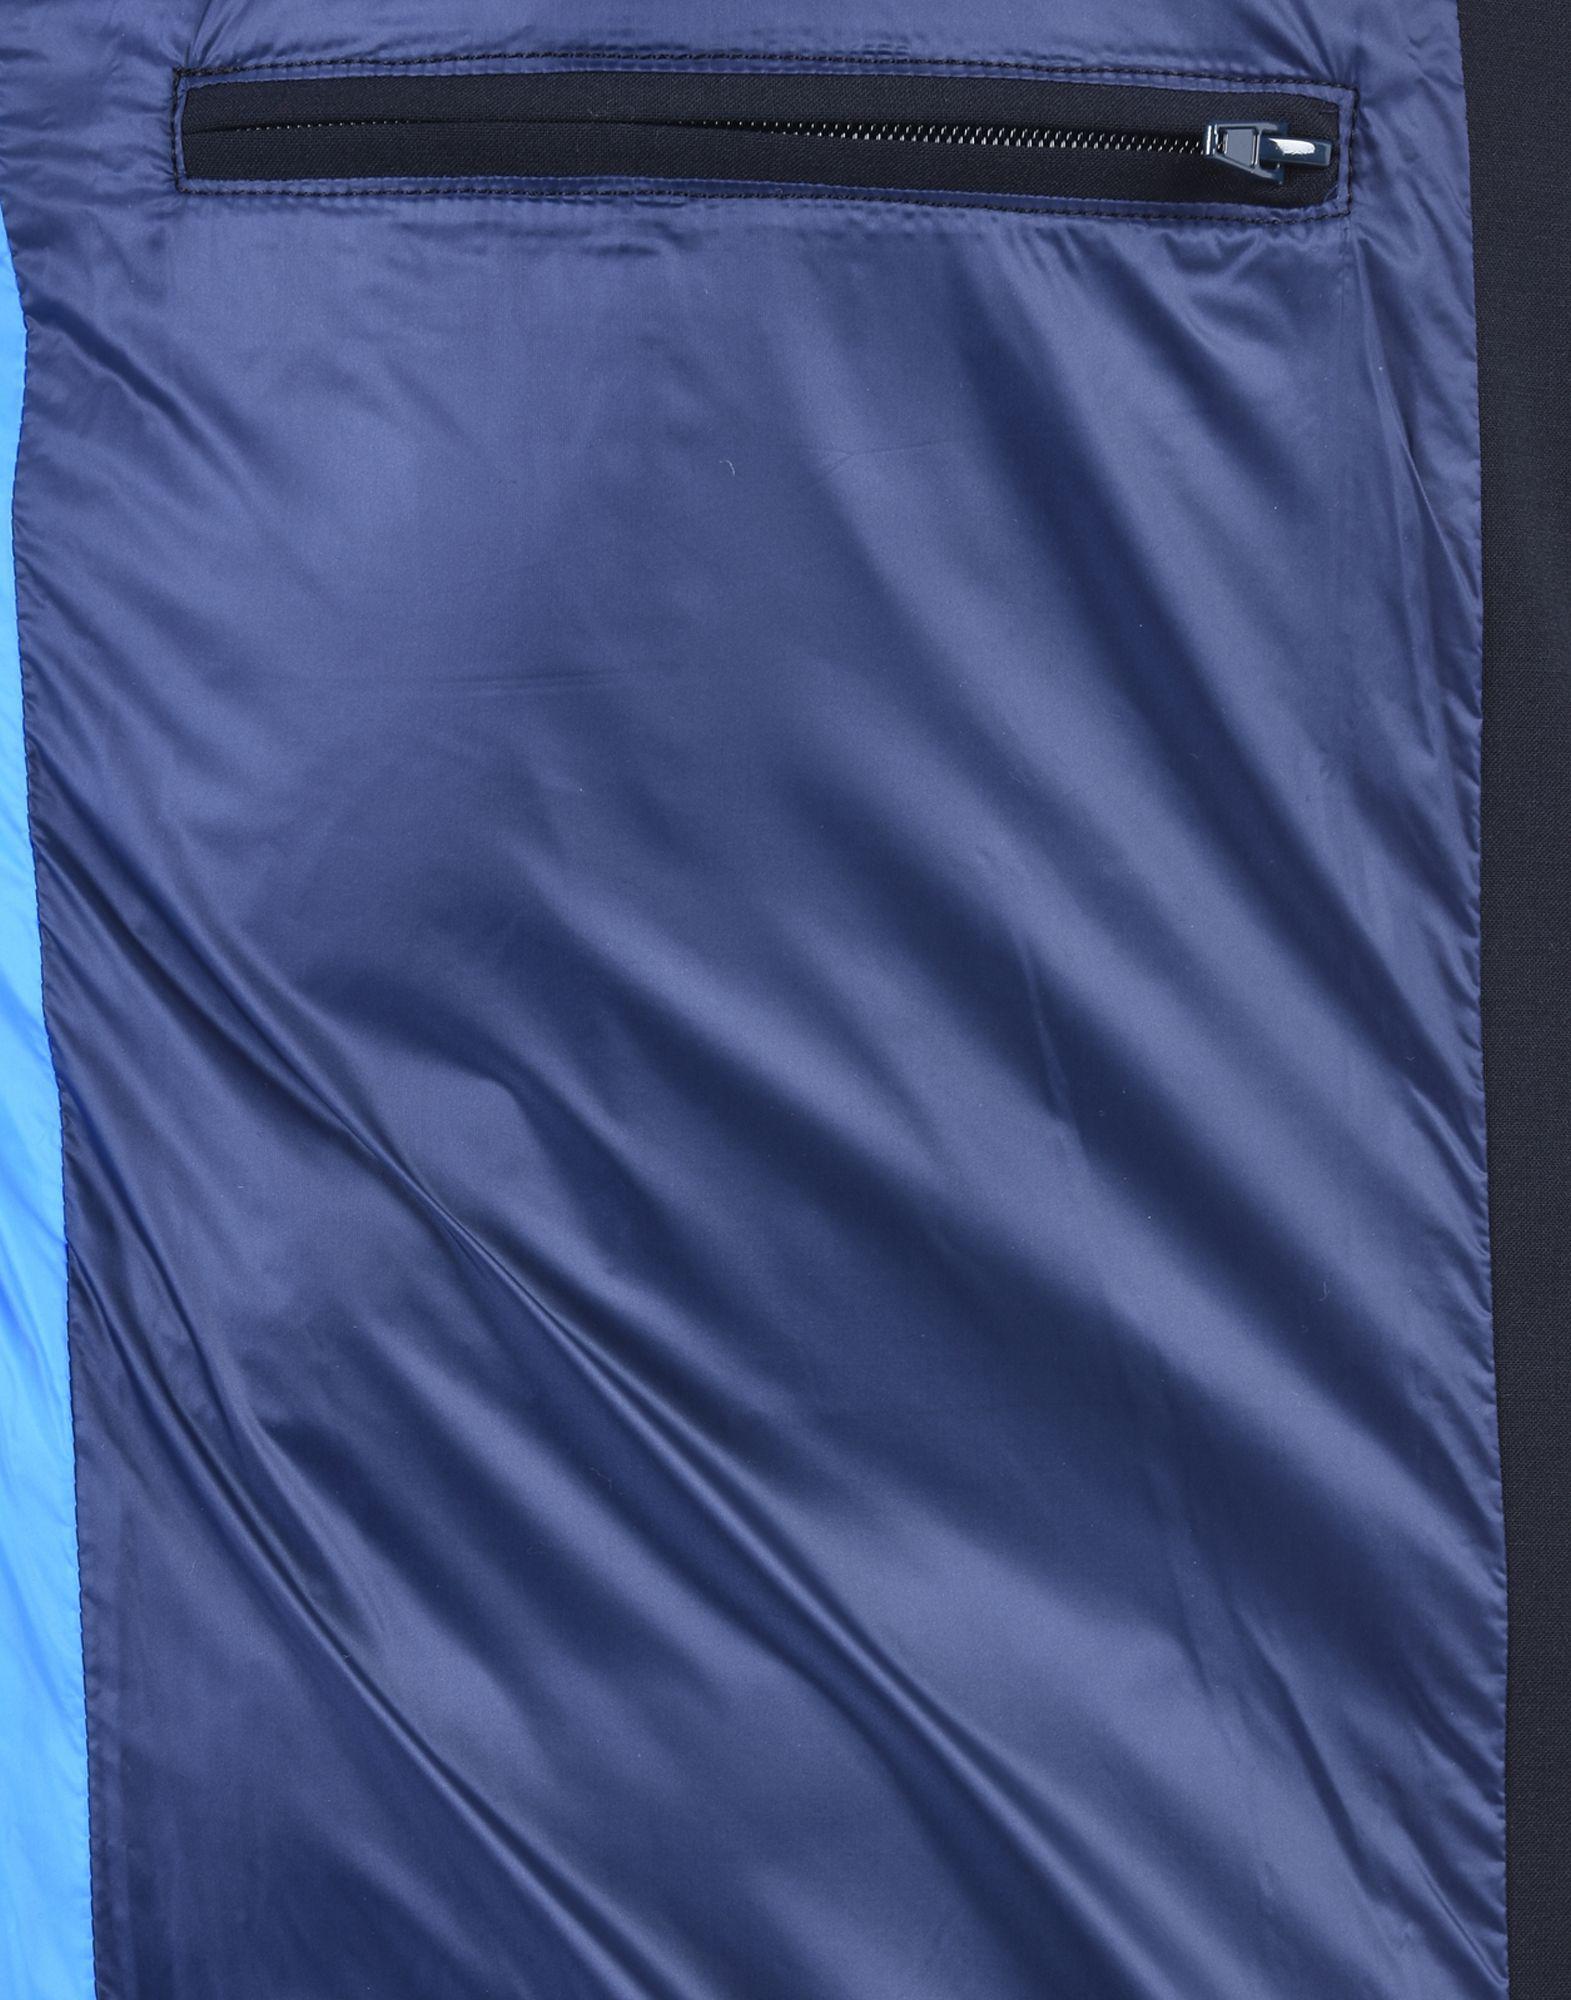 Rossignol Wool Down Jacket in Dark Blue (Blue) for Men